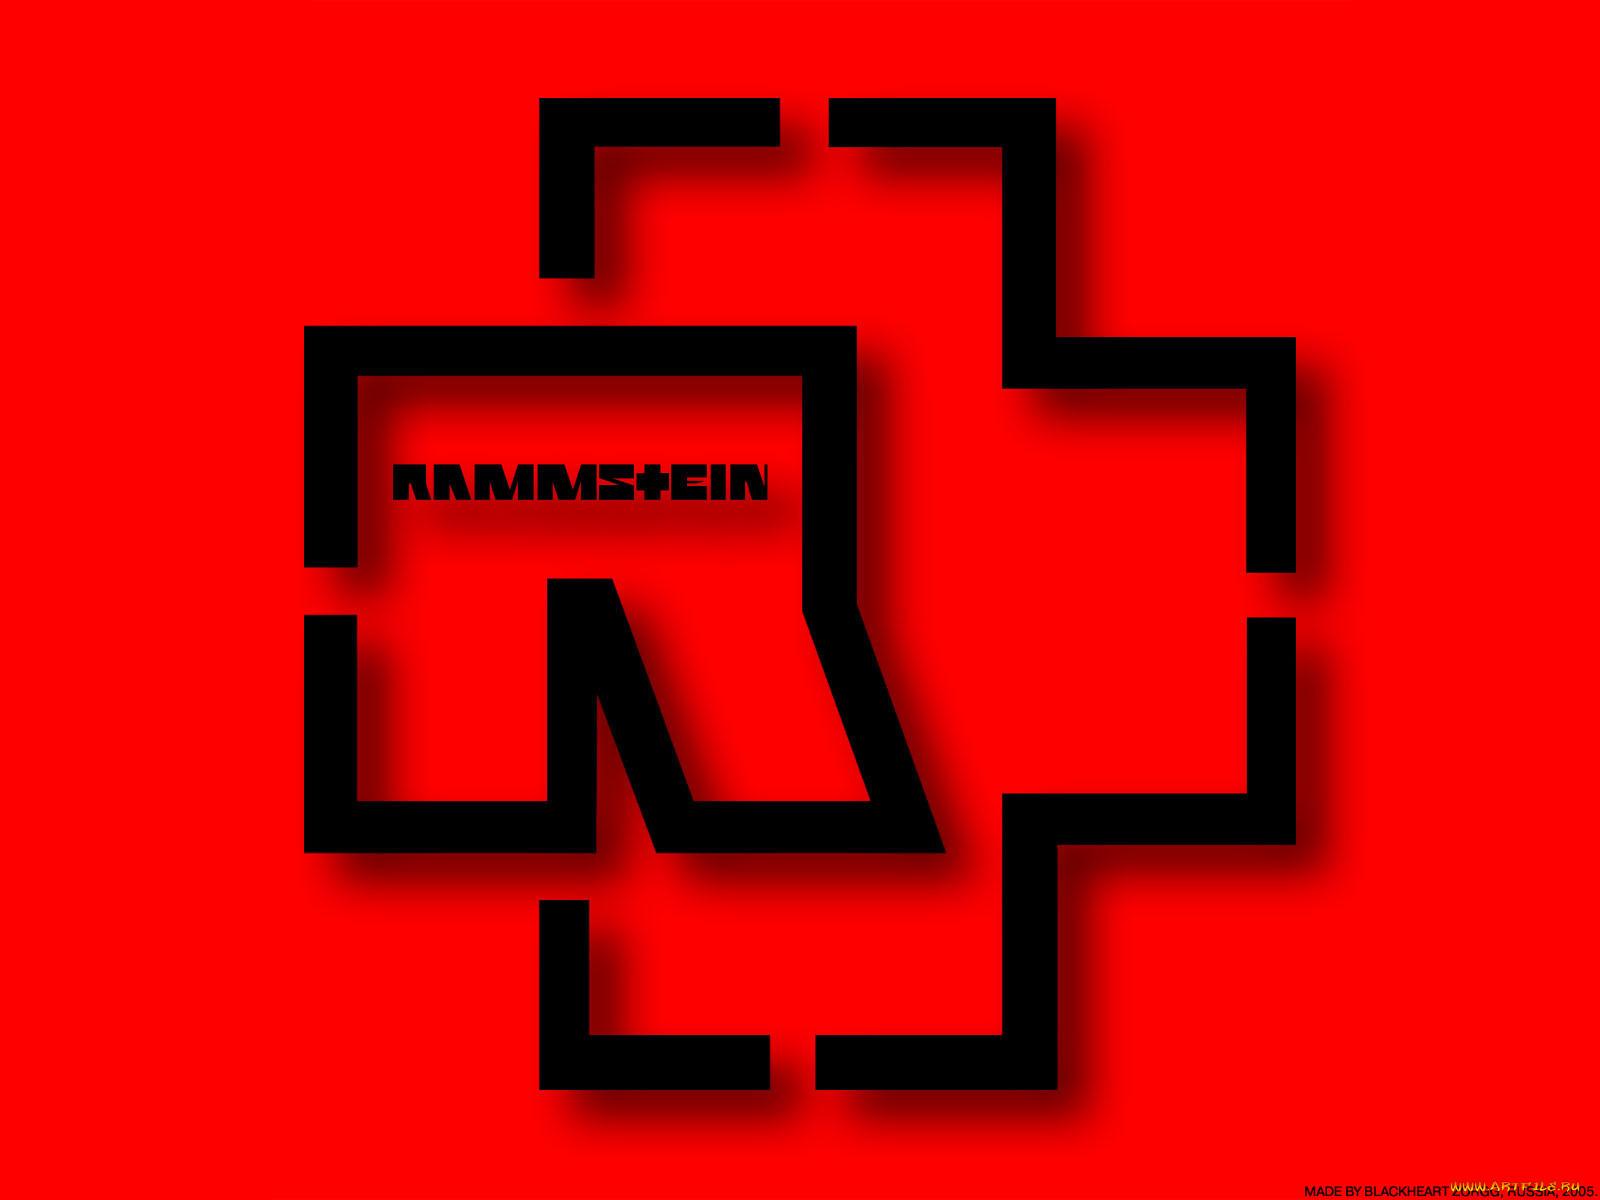 Логотип радио рекорд нд картинки овалы нижней